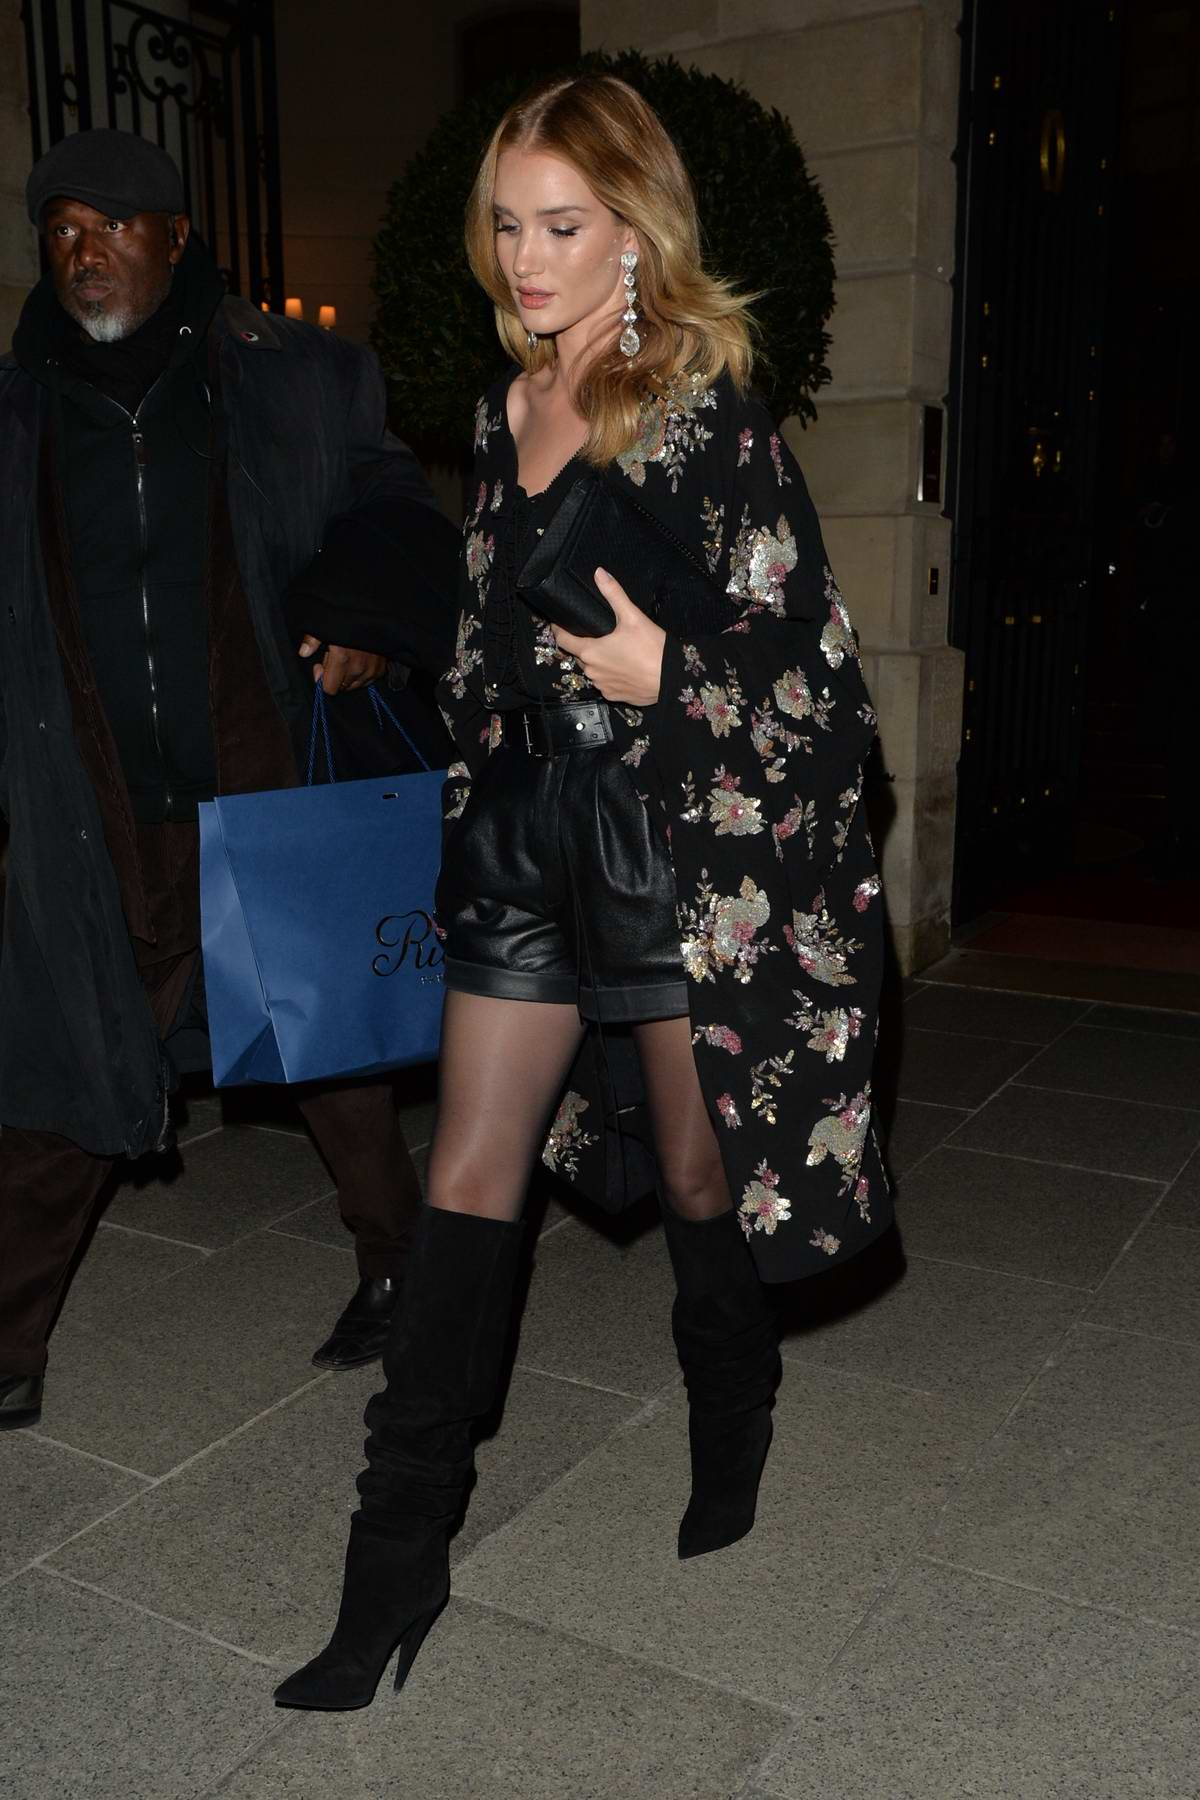 Rosie Huntington-Whiteley leaving the YSL Fashion Show during Paris Fashion Week, France